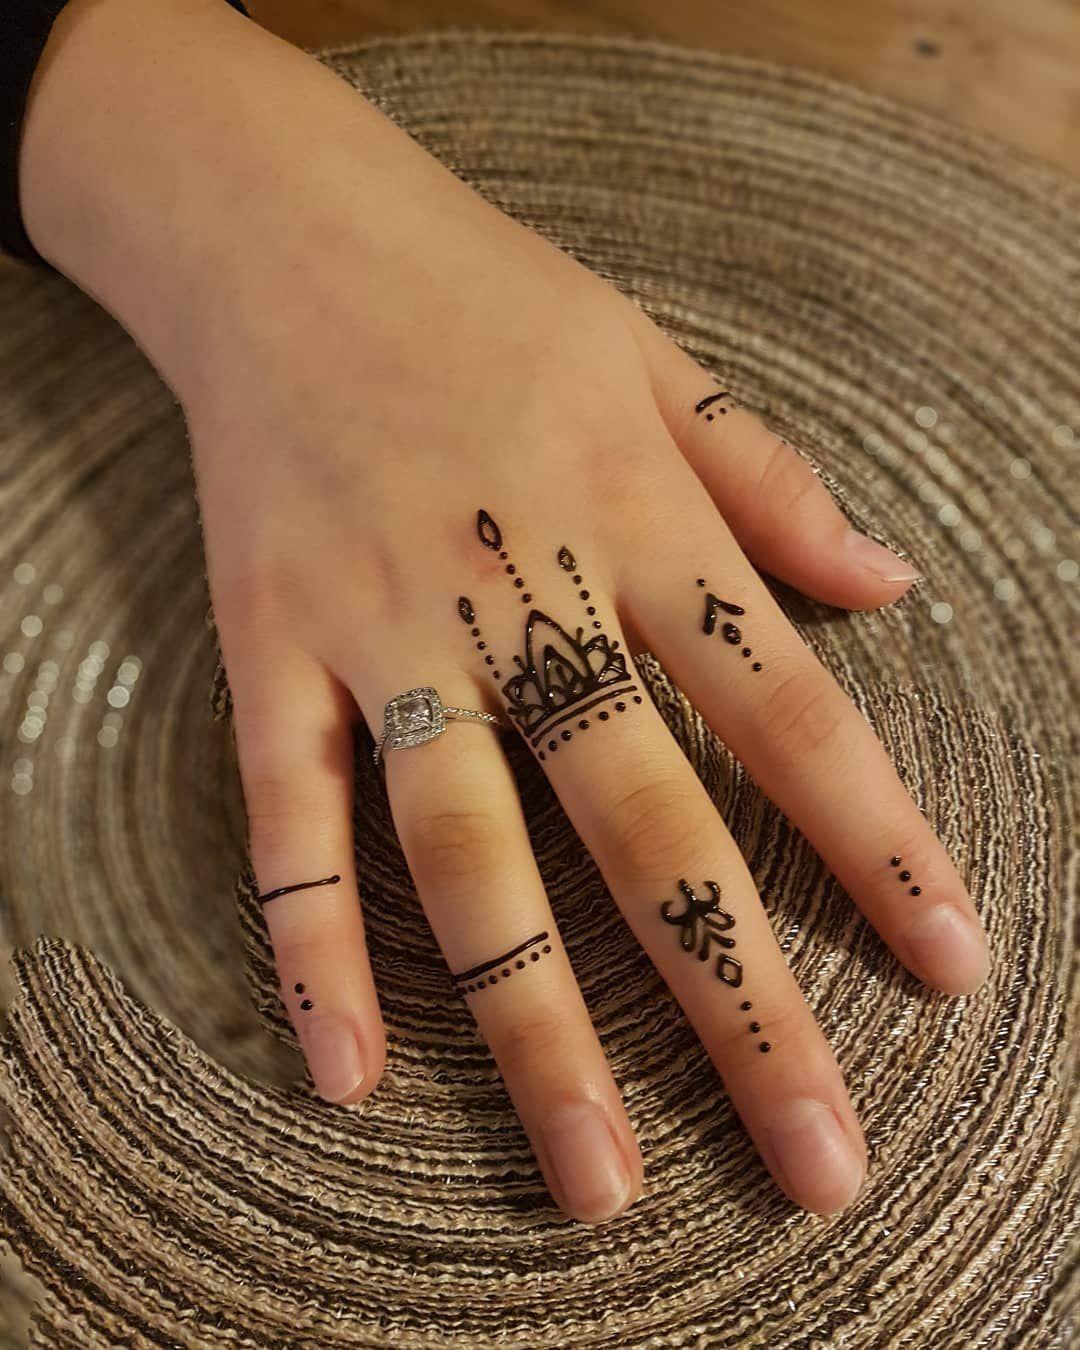 Trendy And Stunning 140 Finger Mehndi Designs For 2020 Brides Henna Tattoo Hand Henna Tattoo Designs Hand Henna Tattoo Designs